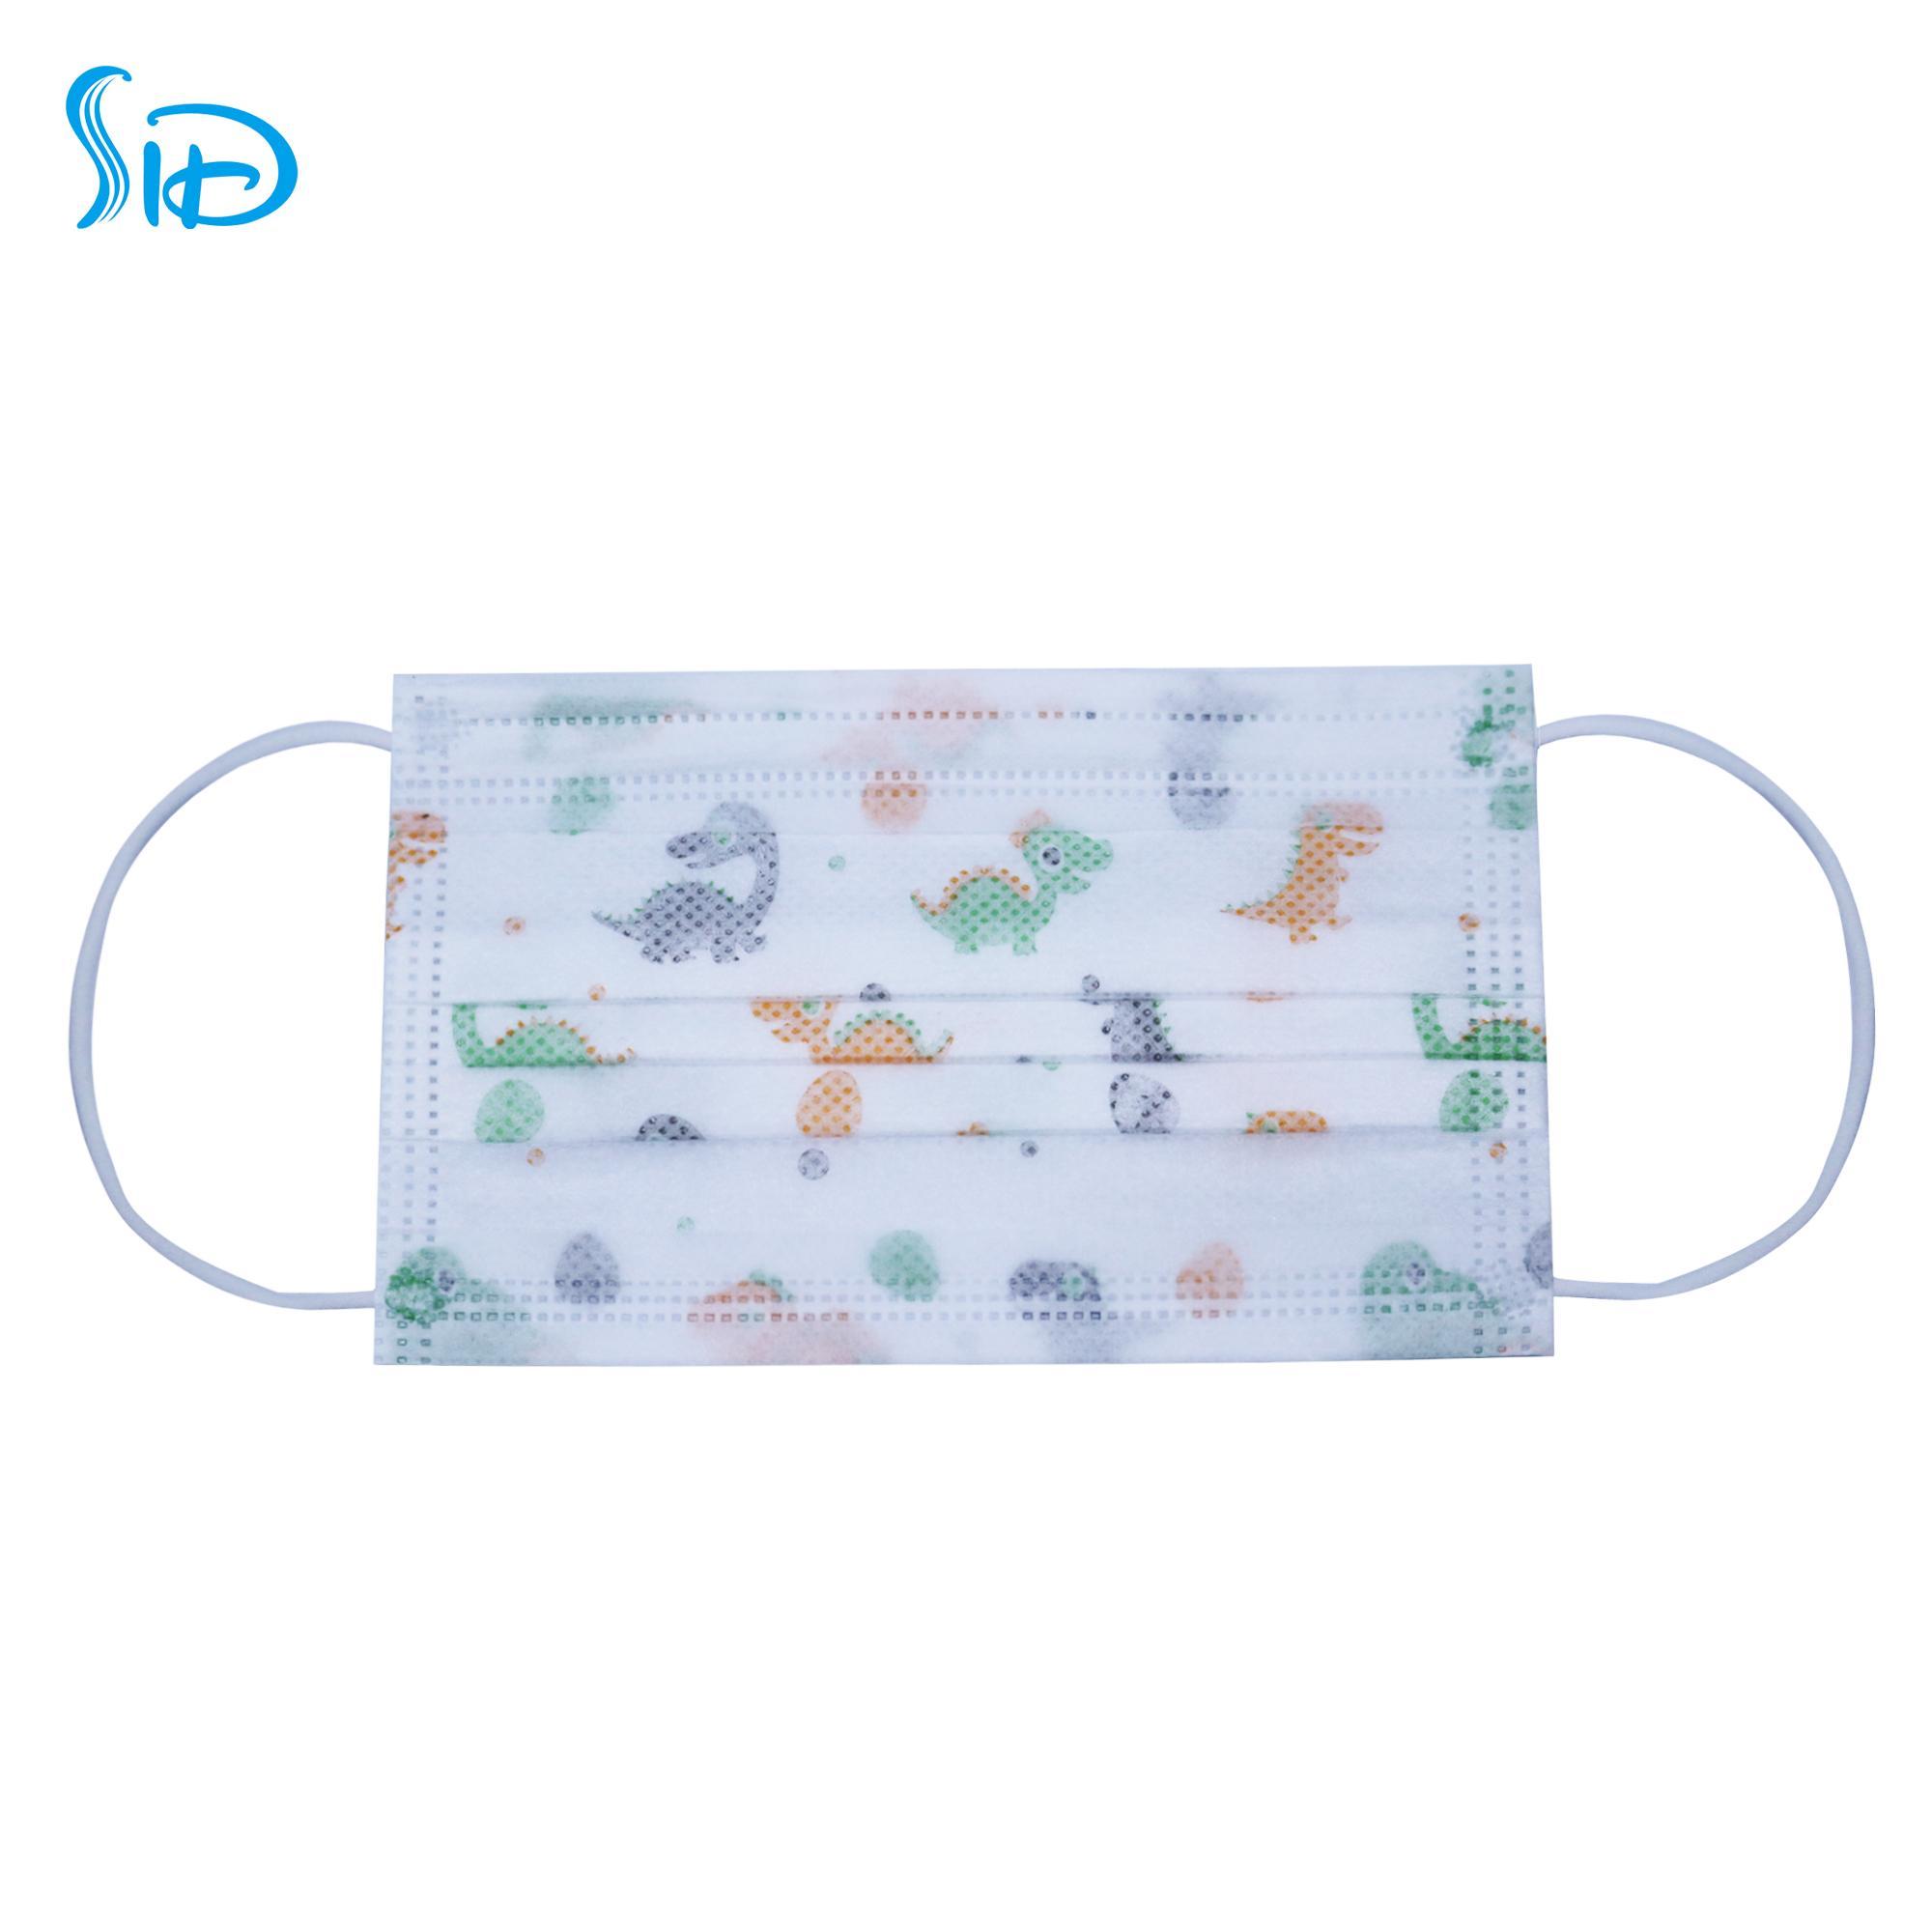 Disposable three-layer non-woven cloth cute cartoon children's baby face mask 2